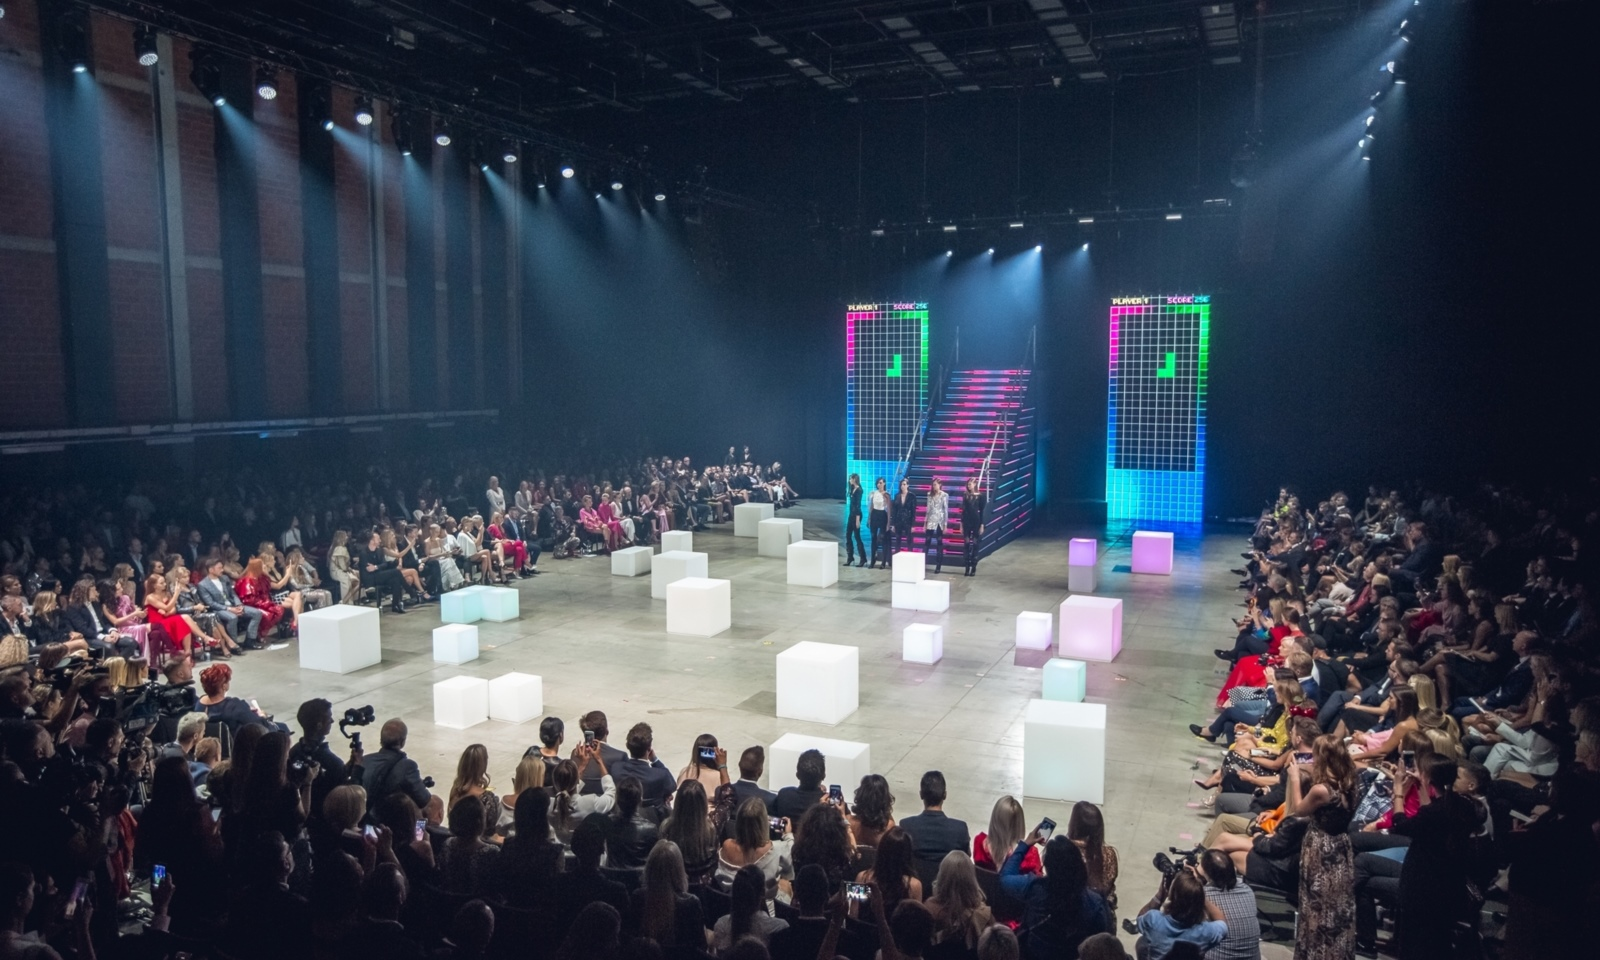 Flesz Fashion Night 2019 Brill AV Media